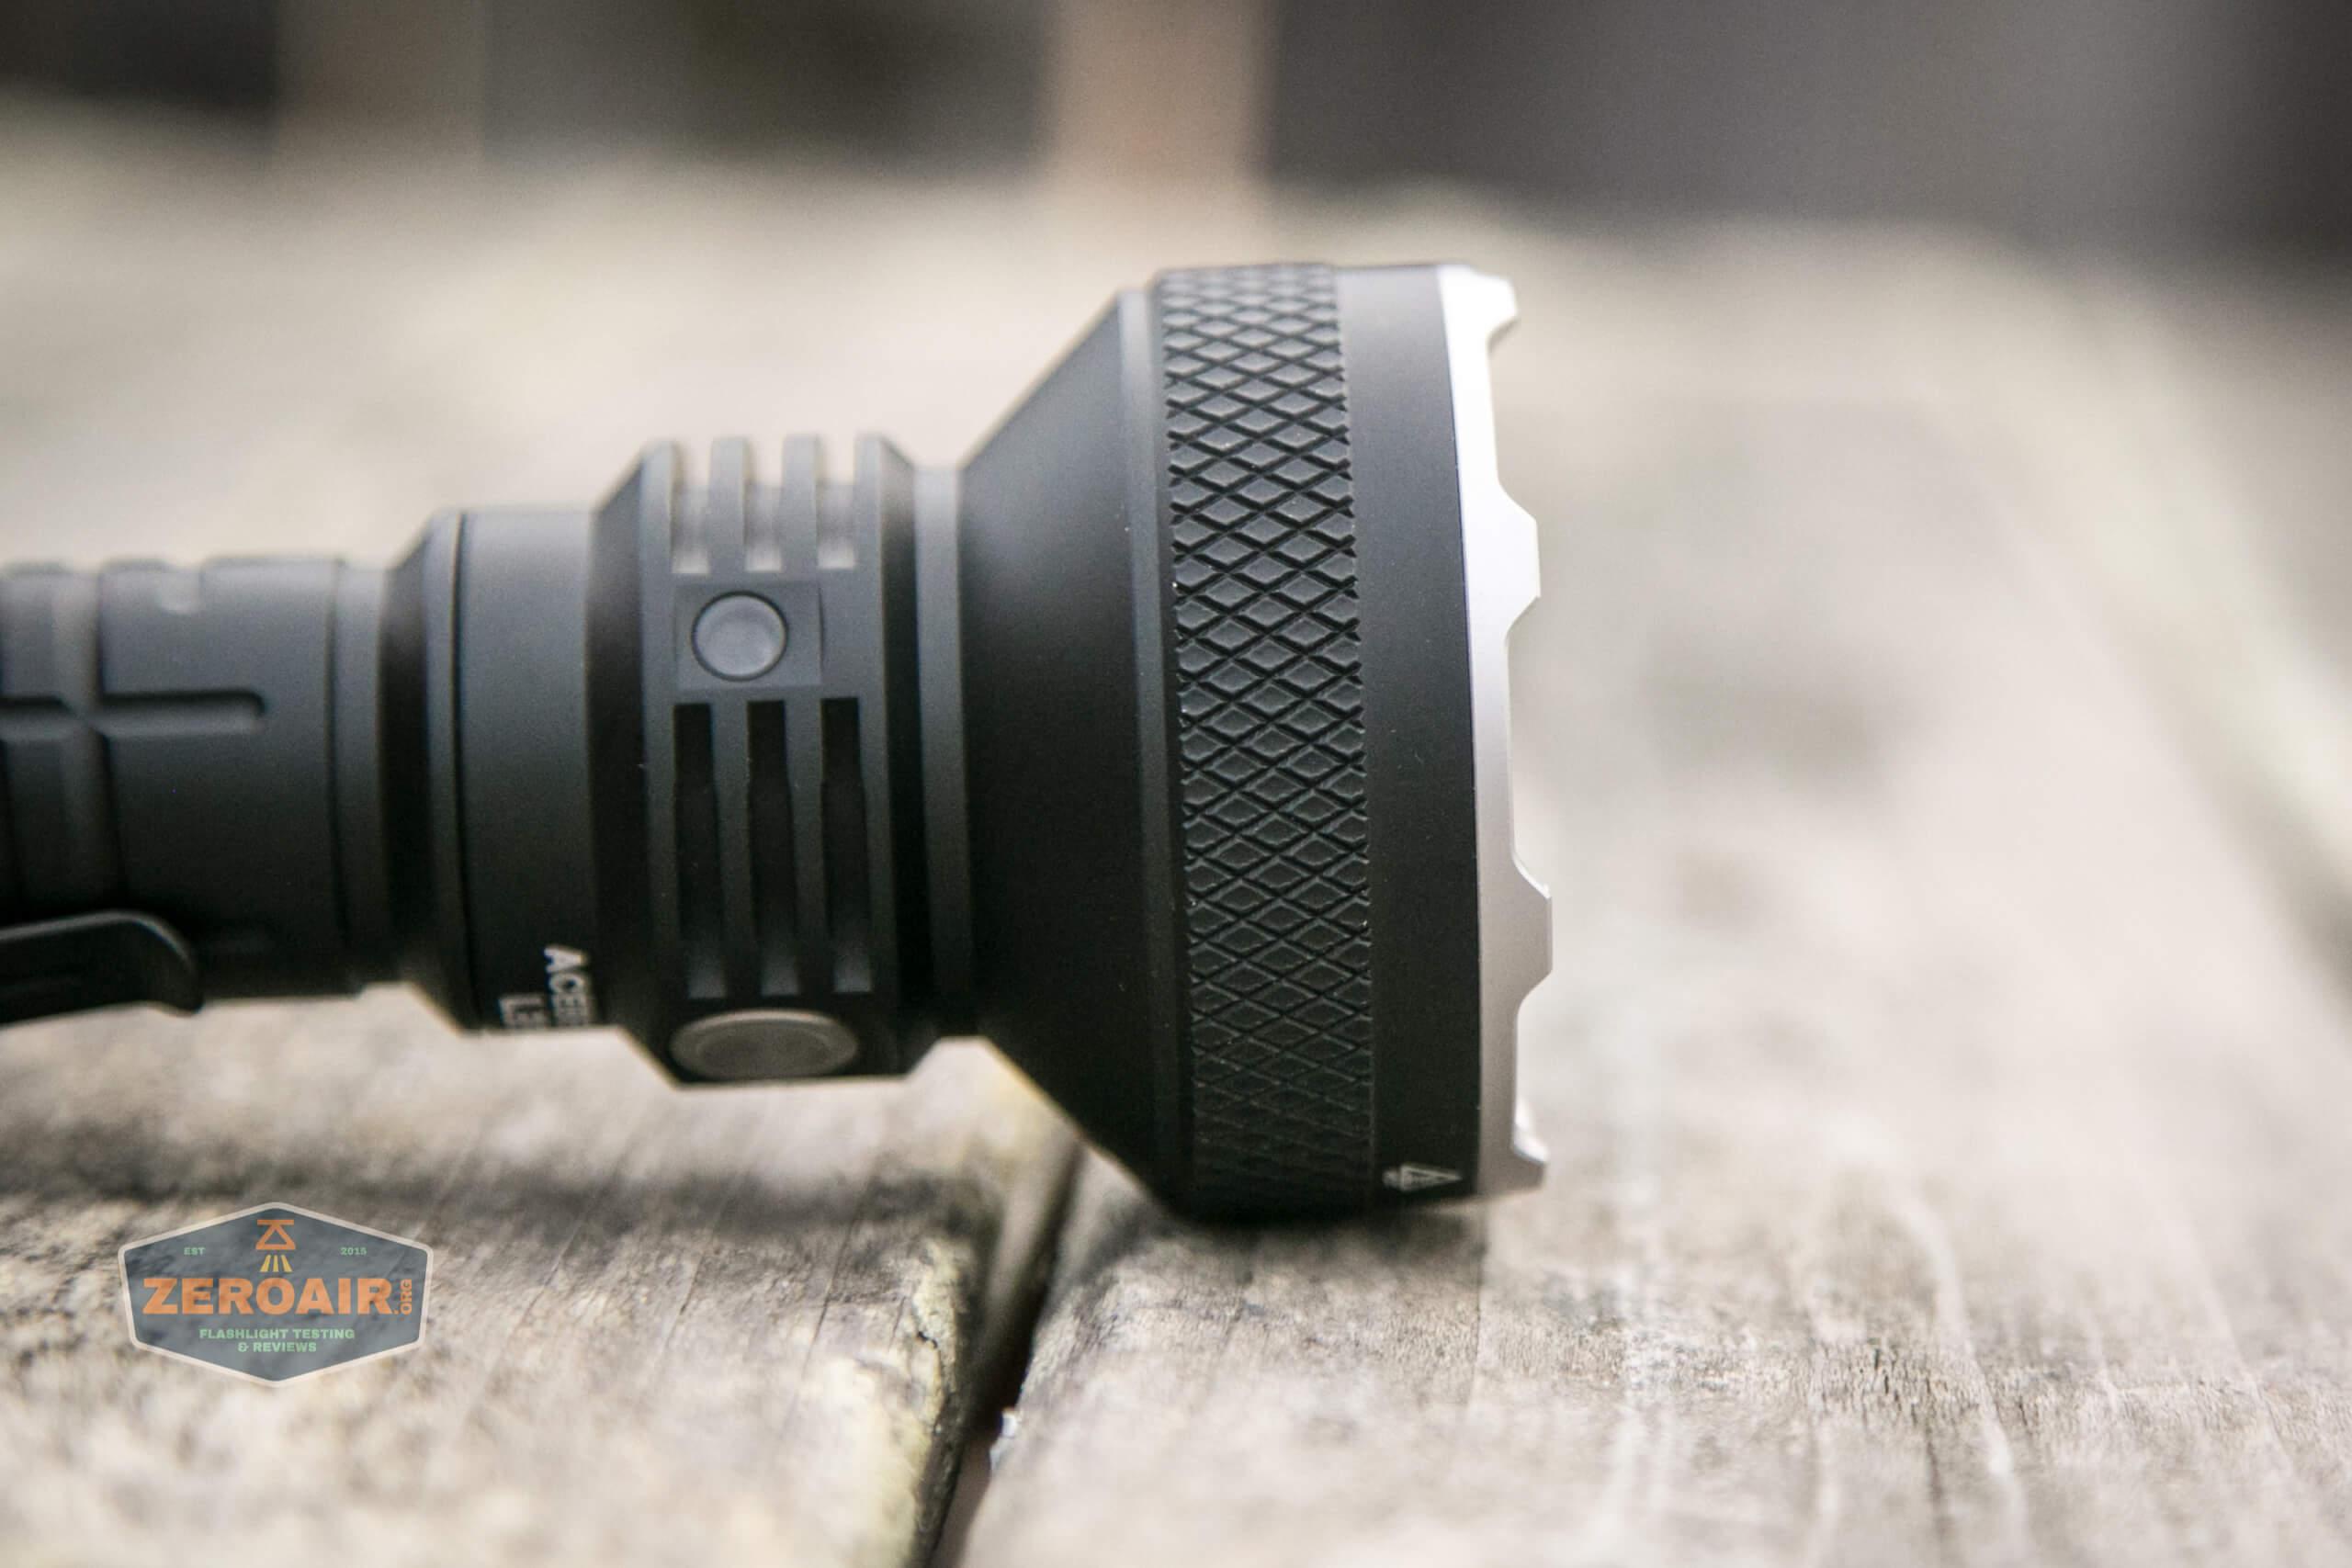 acebeam l35 flashlight laying on side, bezel detail